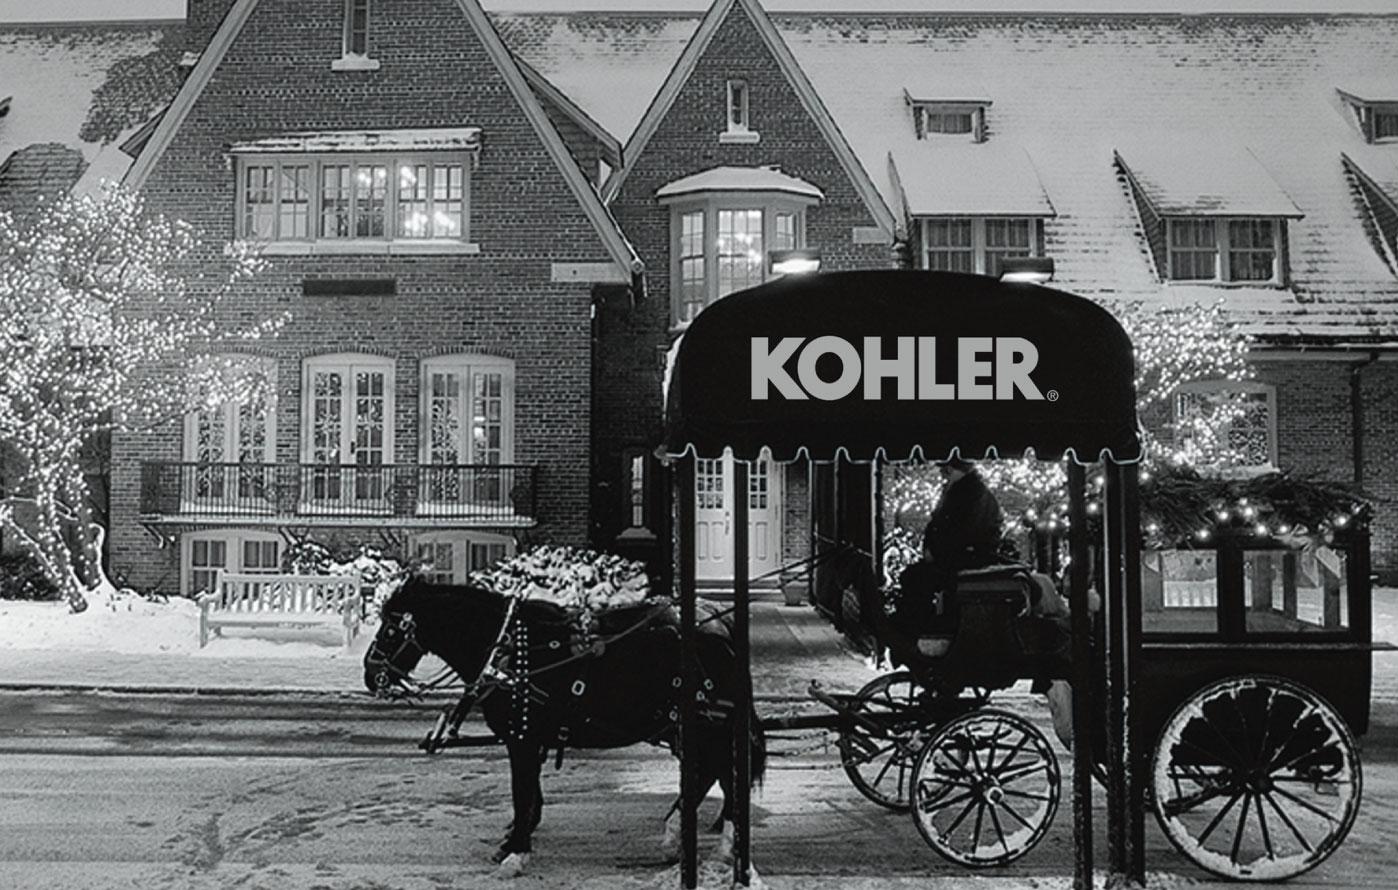 lịch sử kohler